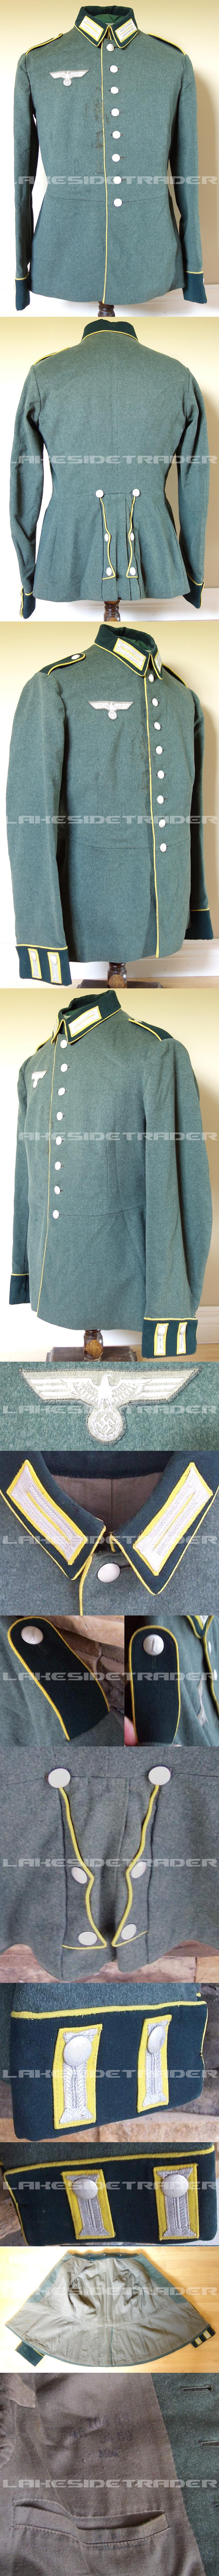 Army Signals EM's M35 Dress Tunic